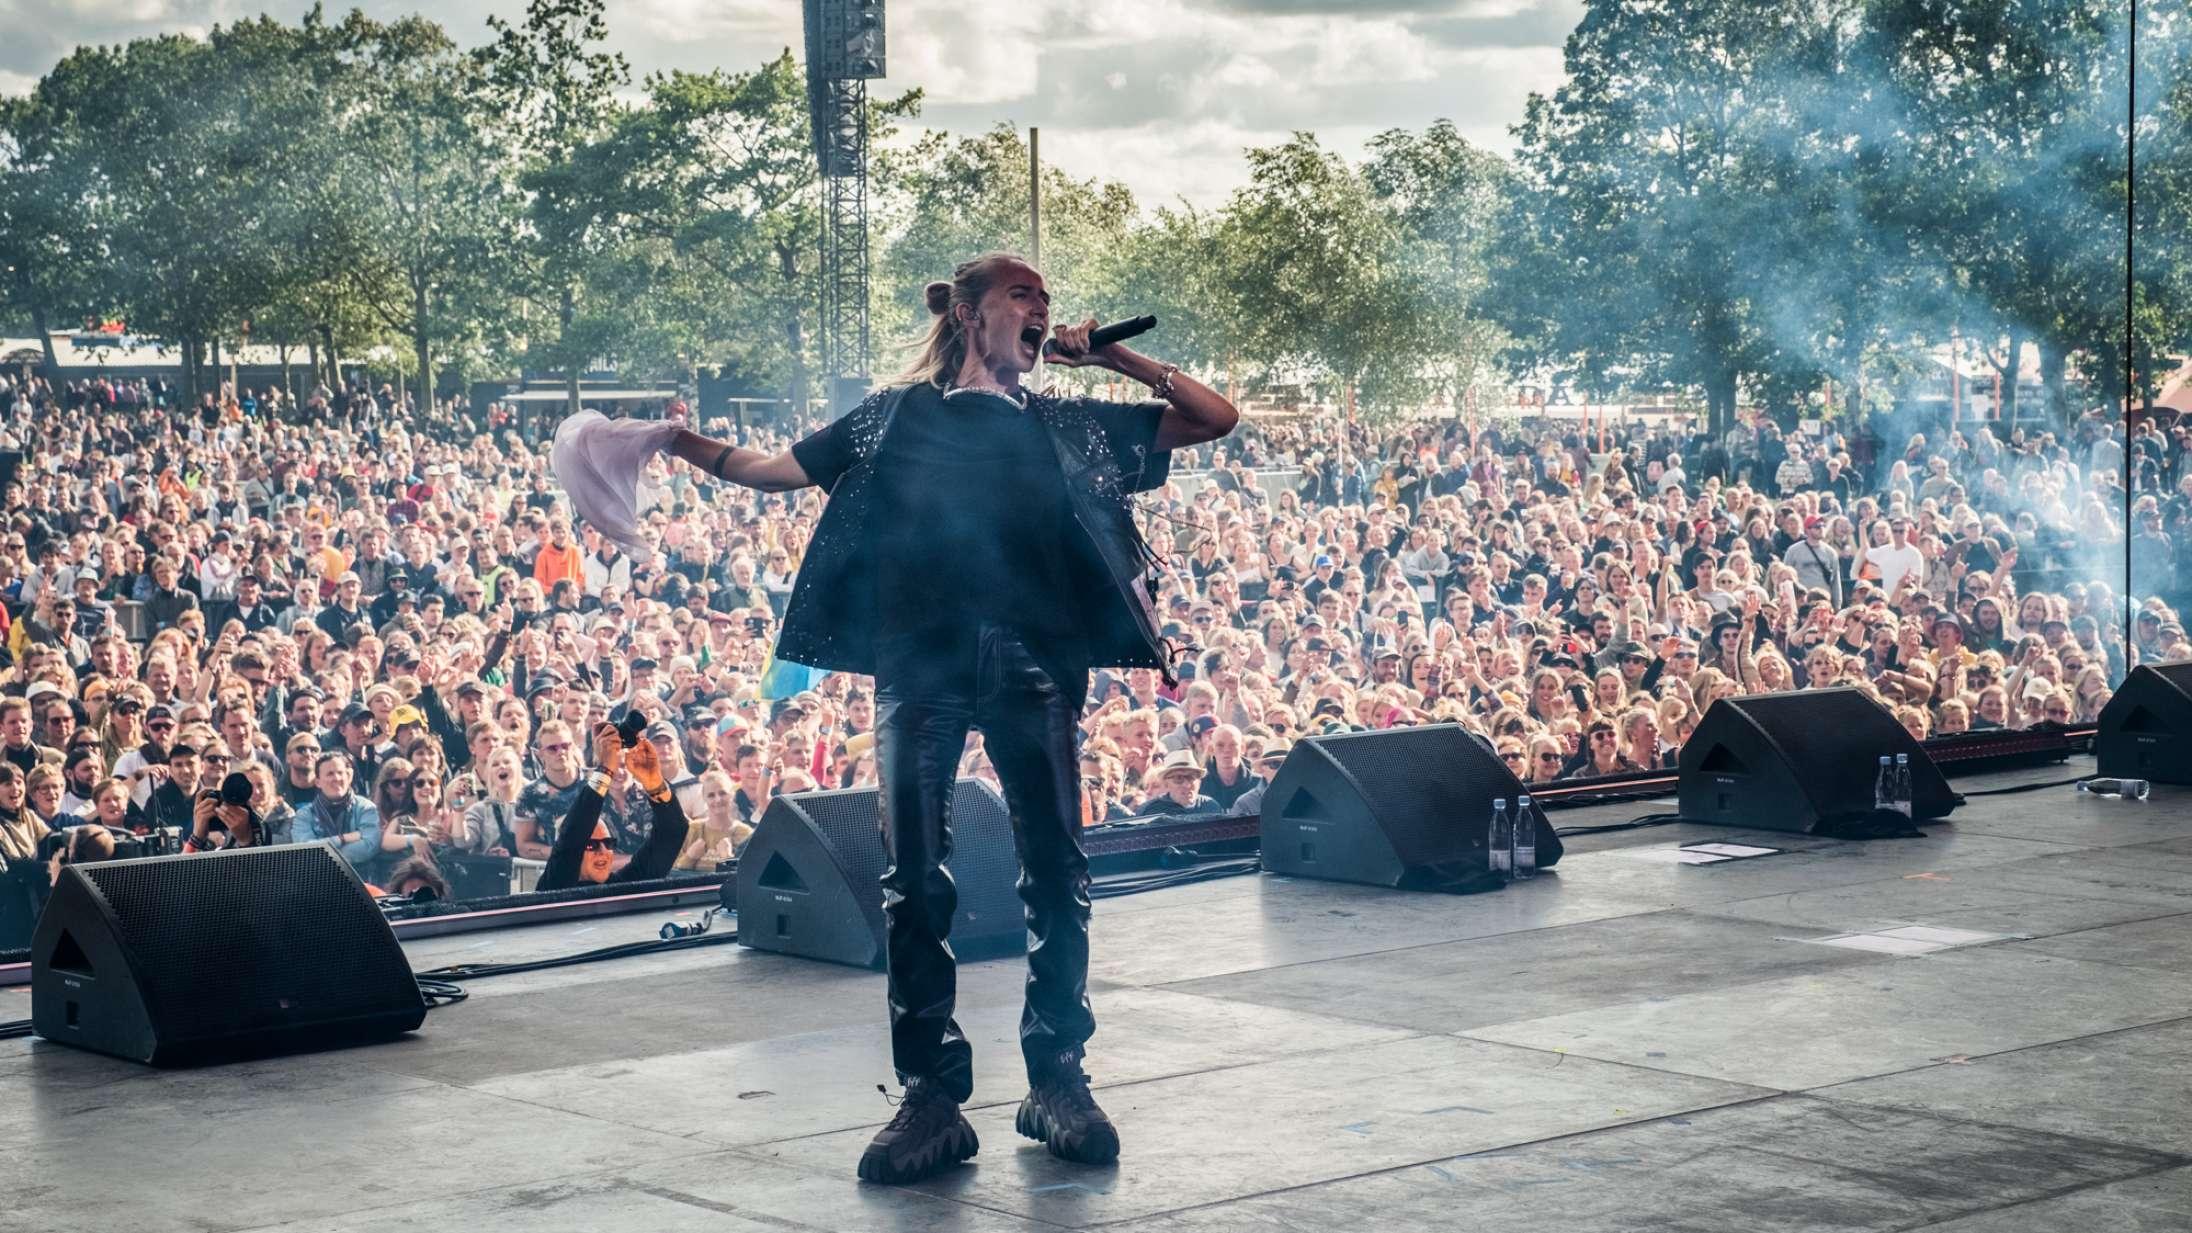 Nu skal Roskilde Festival tænke kreativt: »Coachella-modellen? Den har vi virkelig ikke kigget ned i. Men der kan være andre modeller«